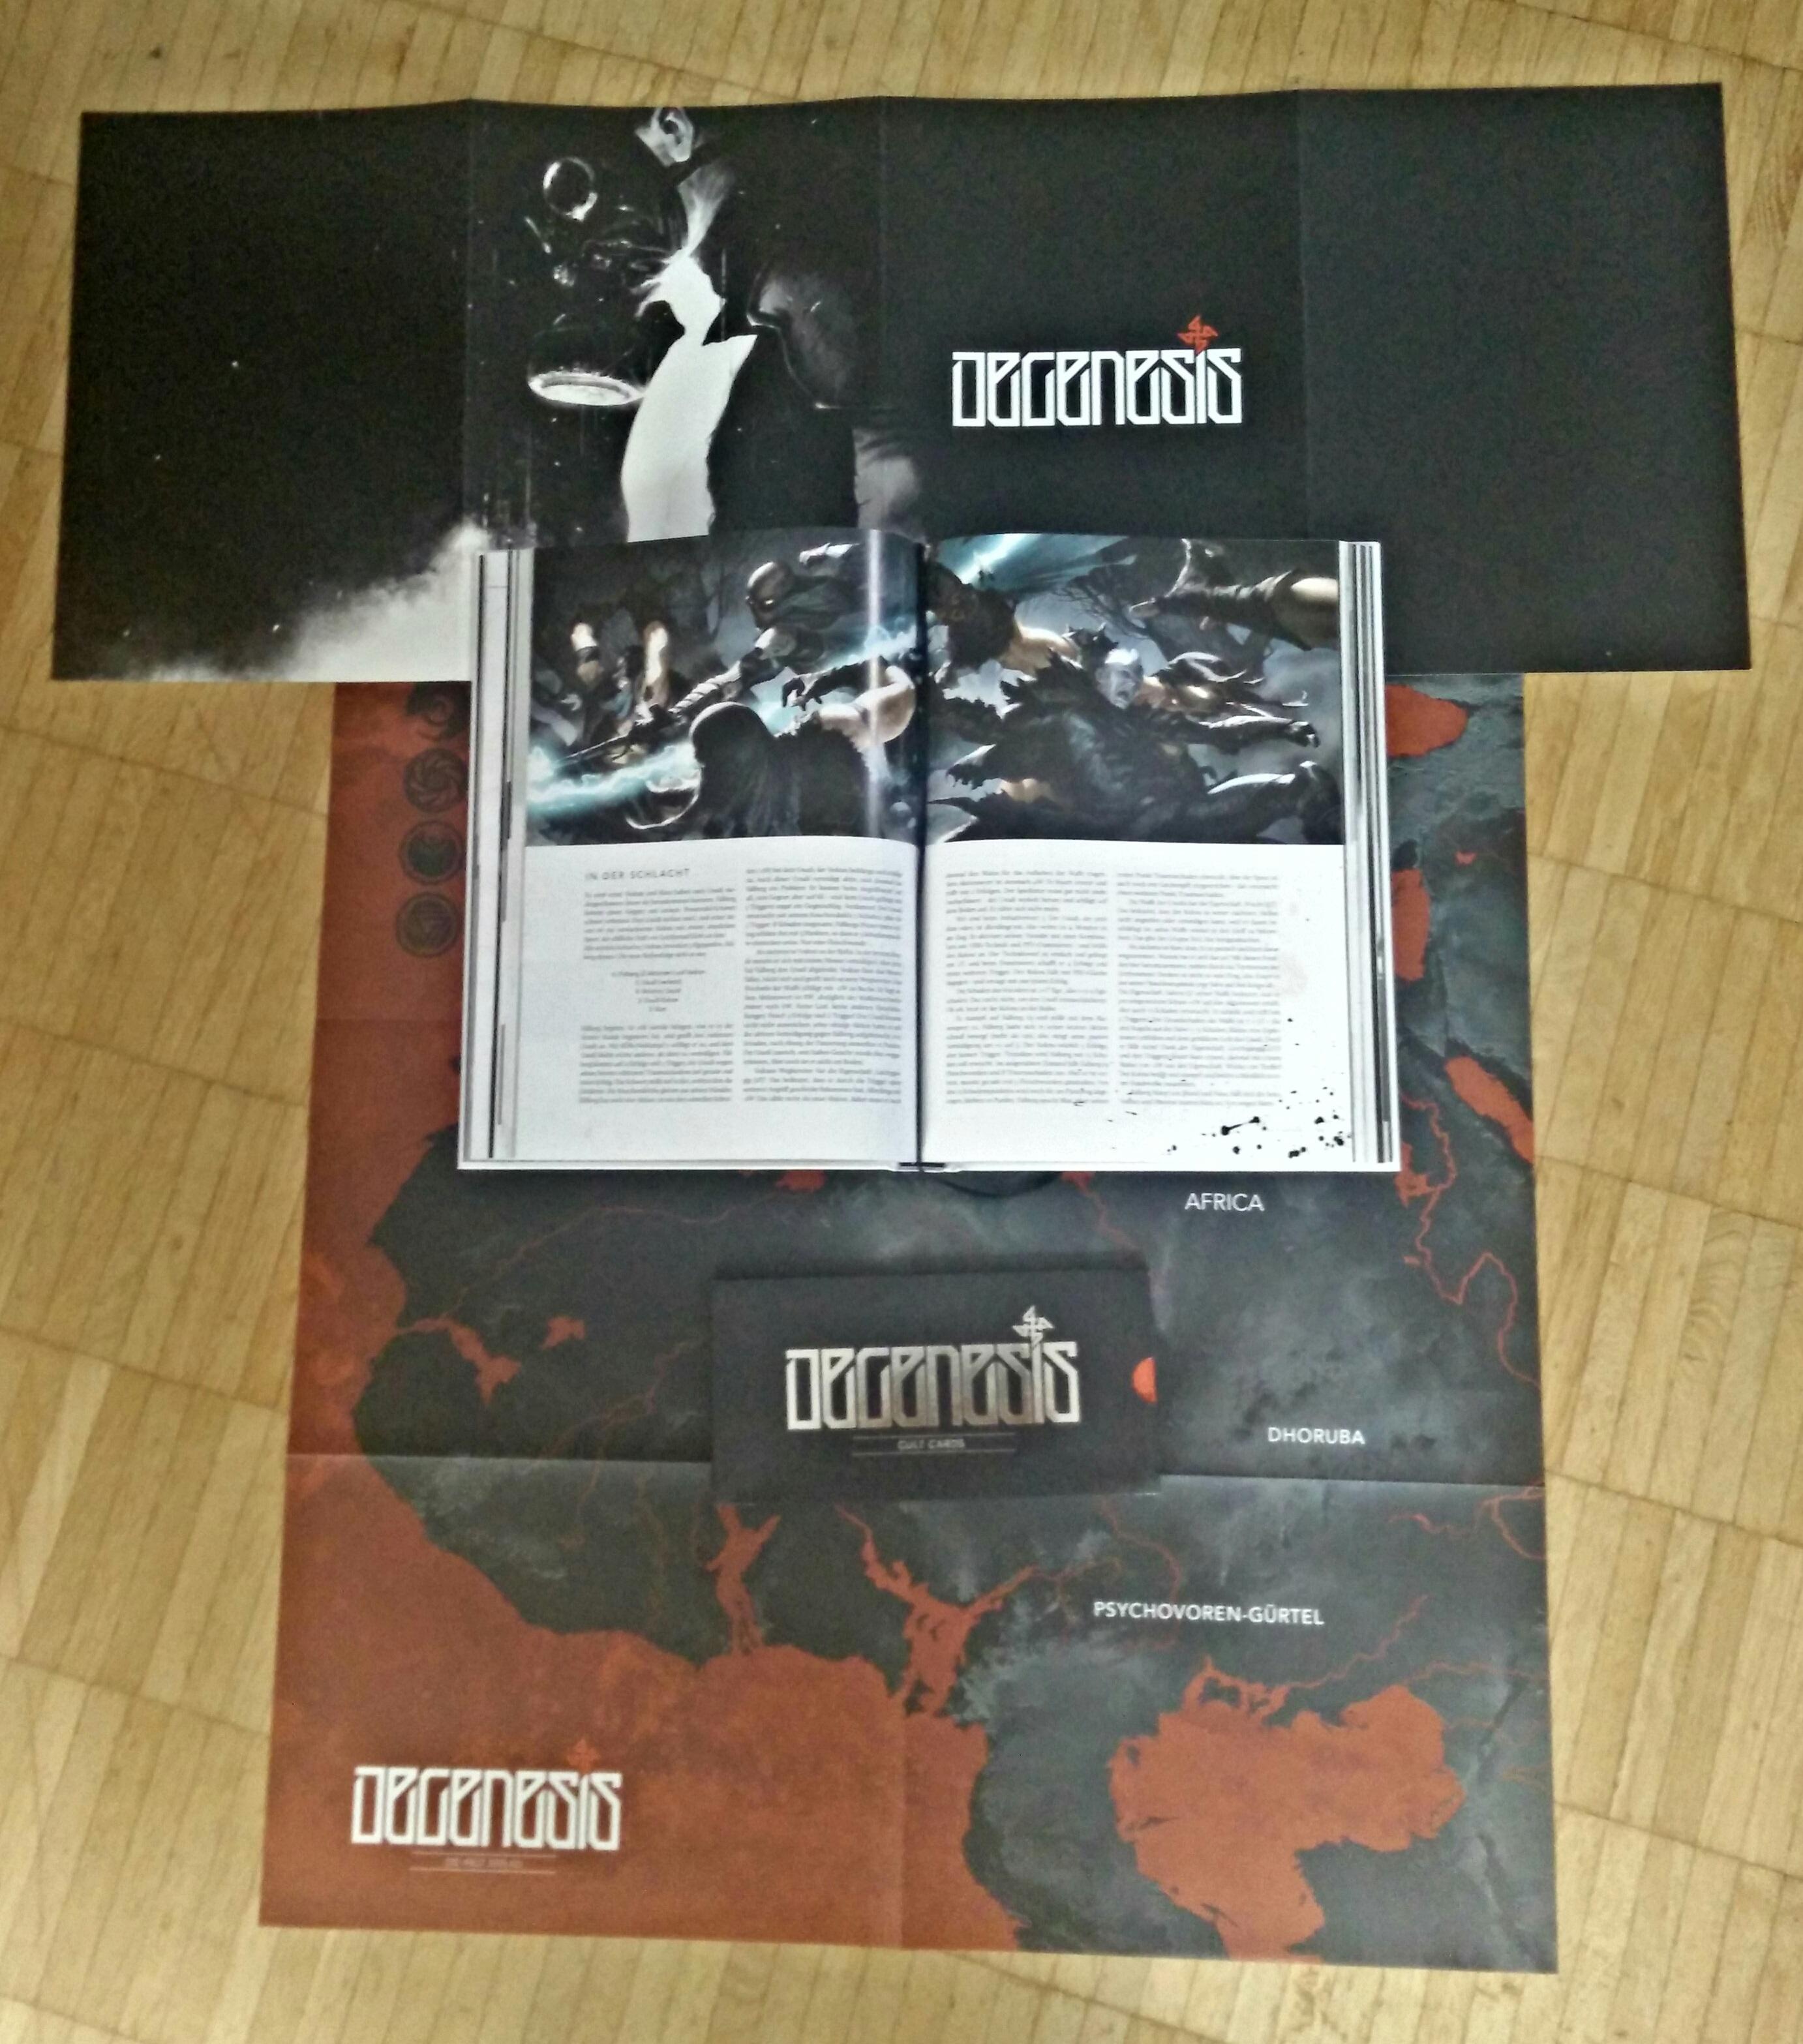 Degenesis: Rebirth Edition - Doppelseite aus Katharsys, dem Spielsystem (Image: obskures.de)